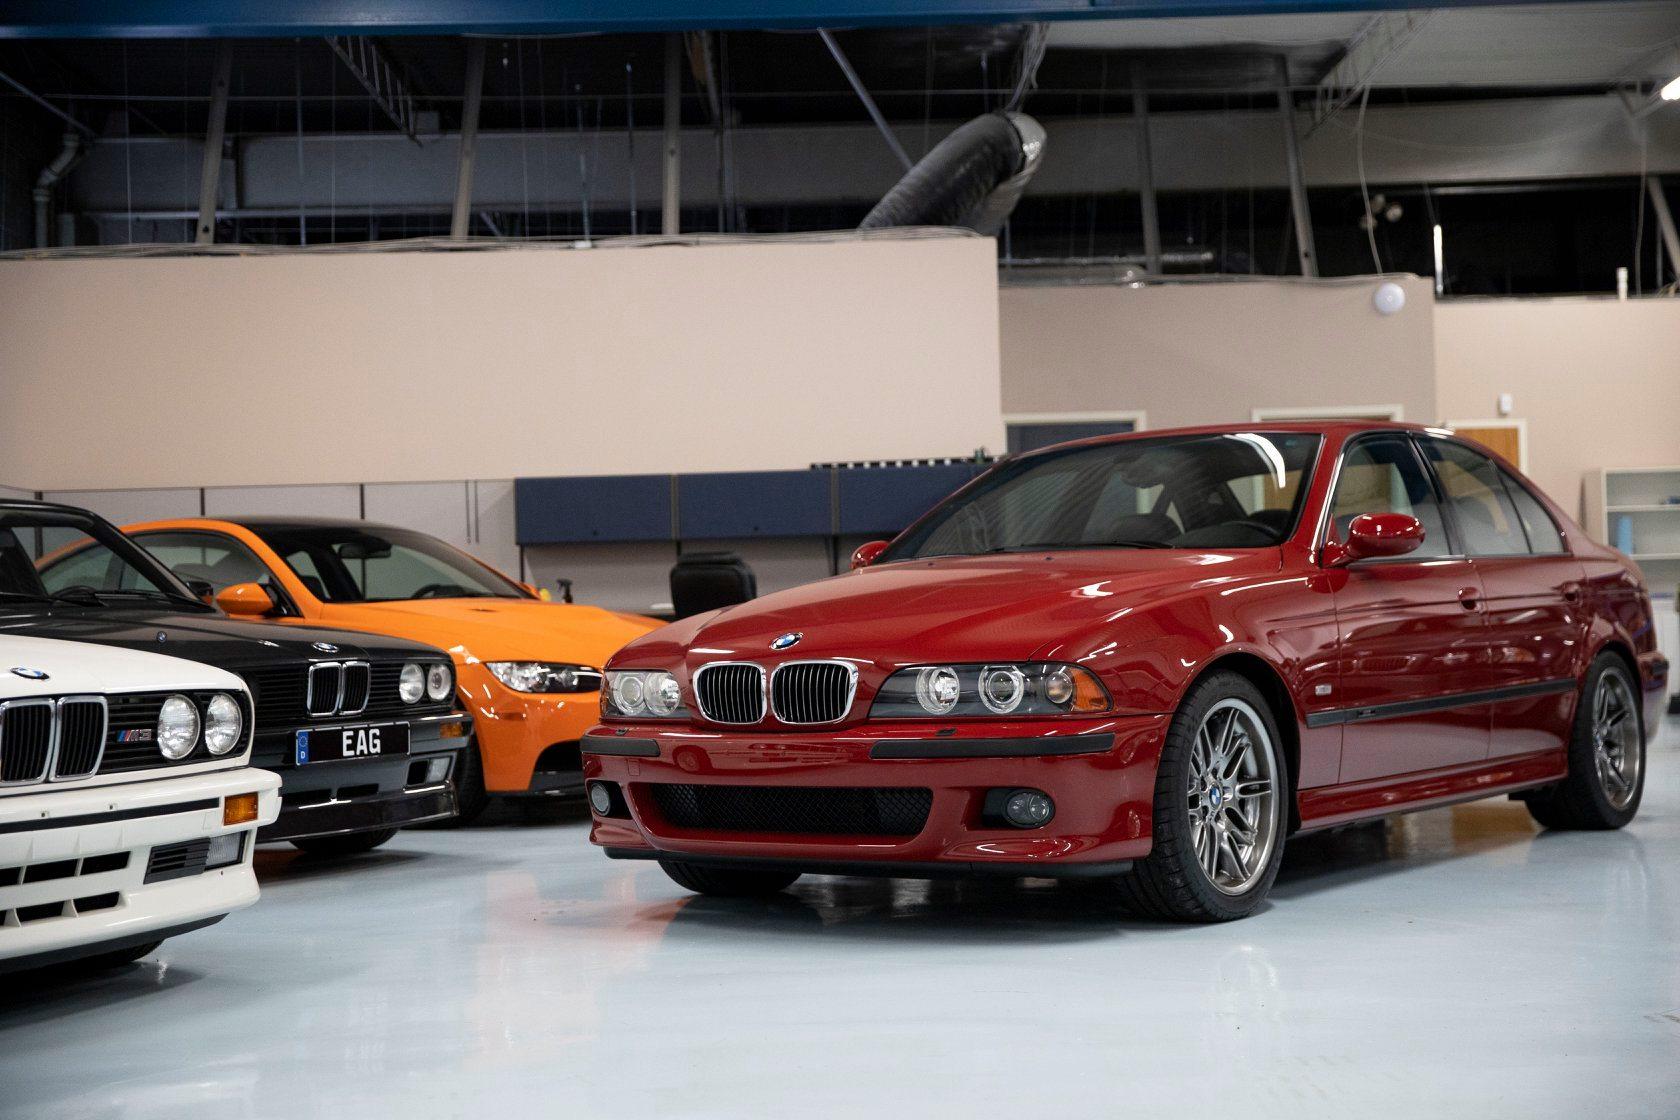 BMW_M5_E39_Imola_Red_0002